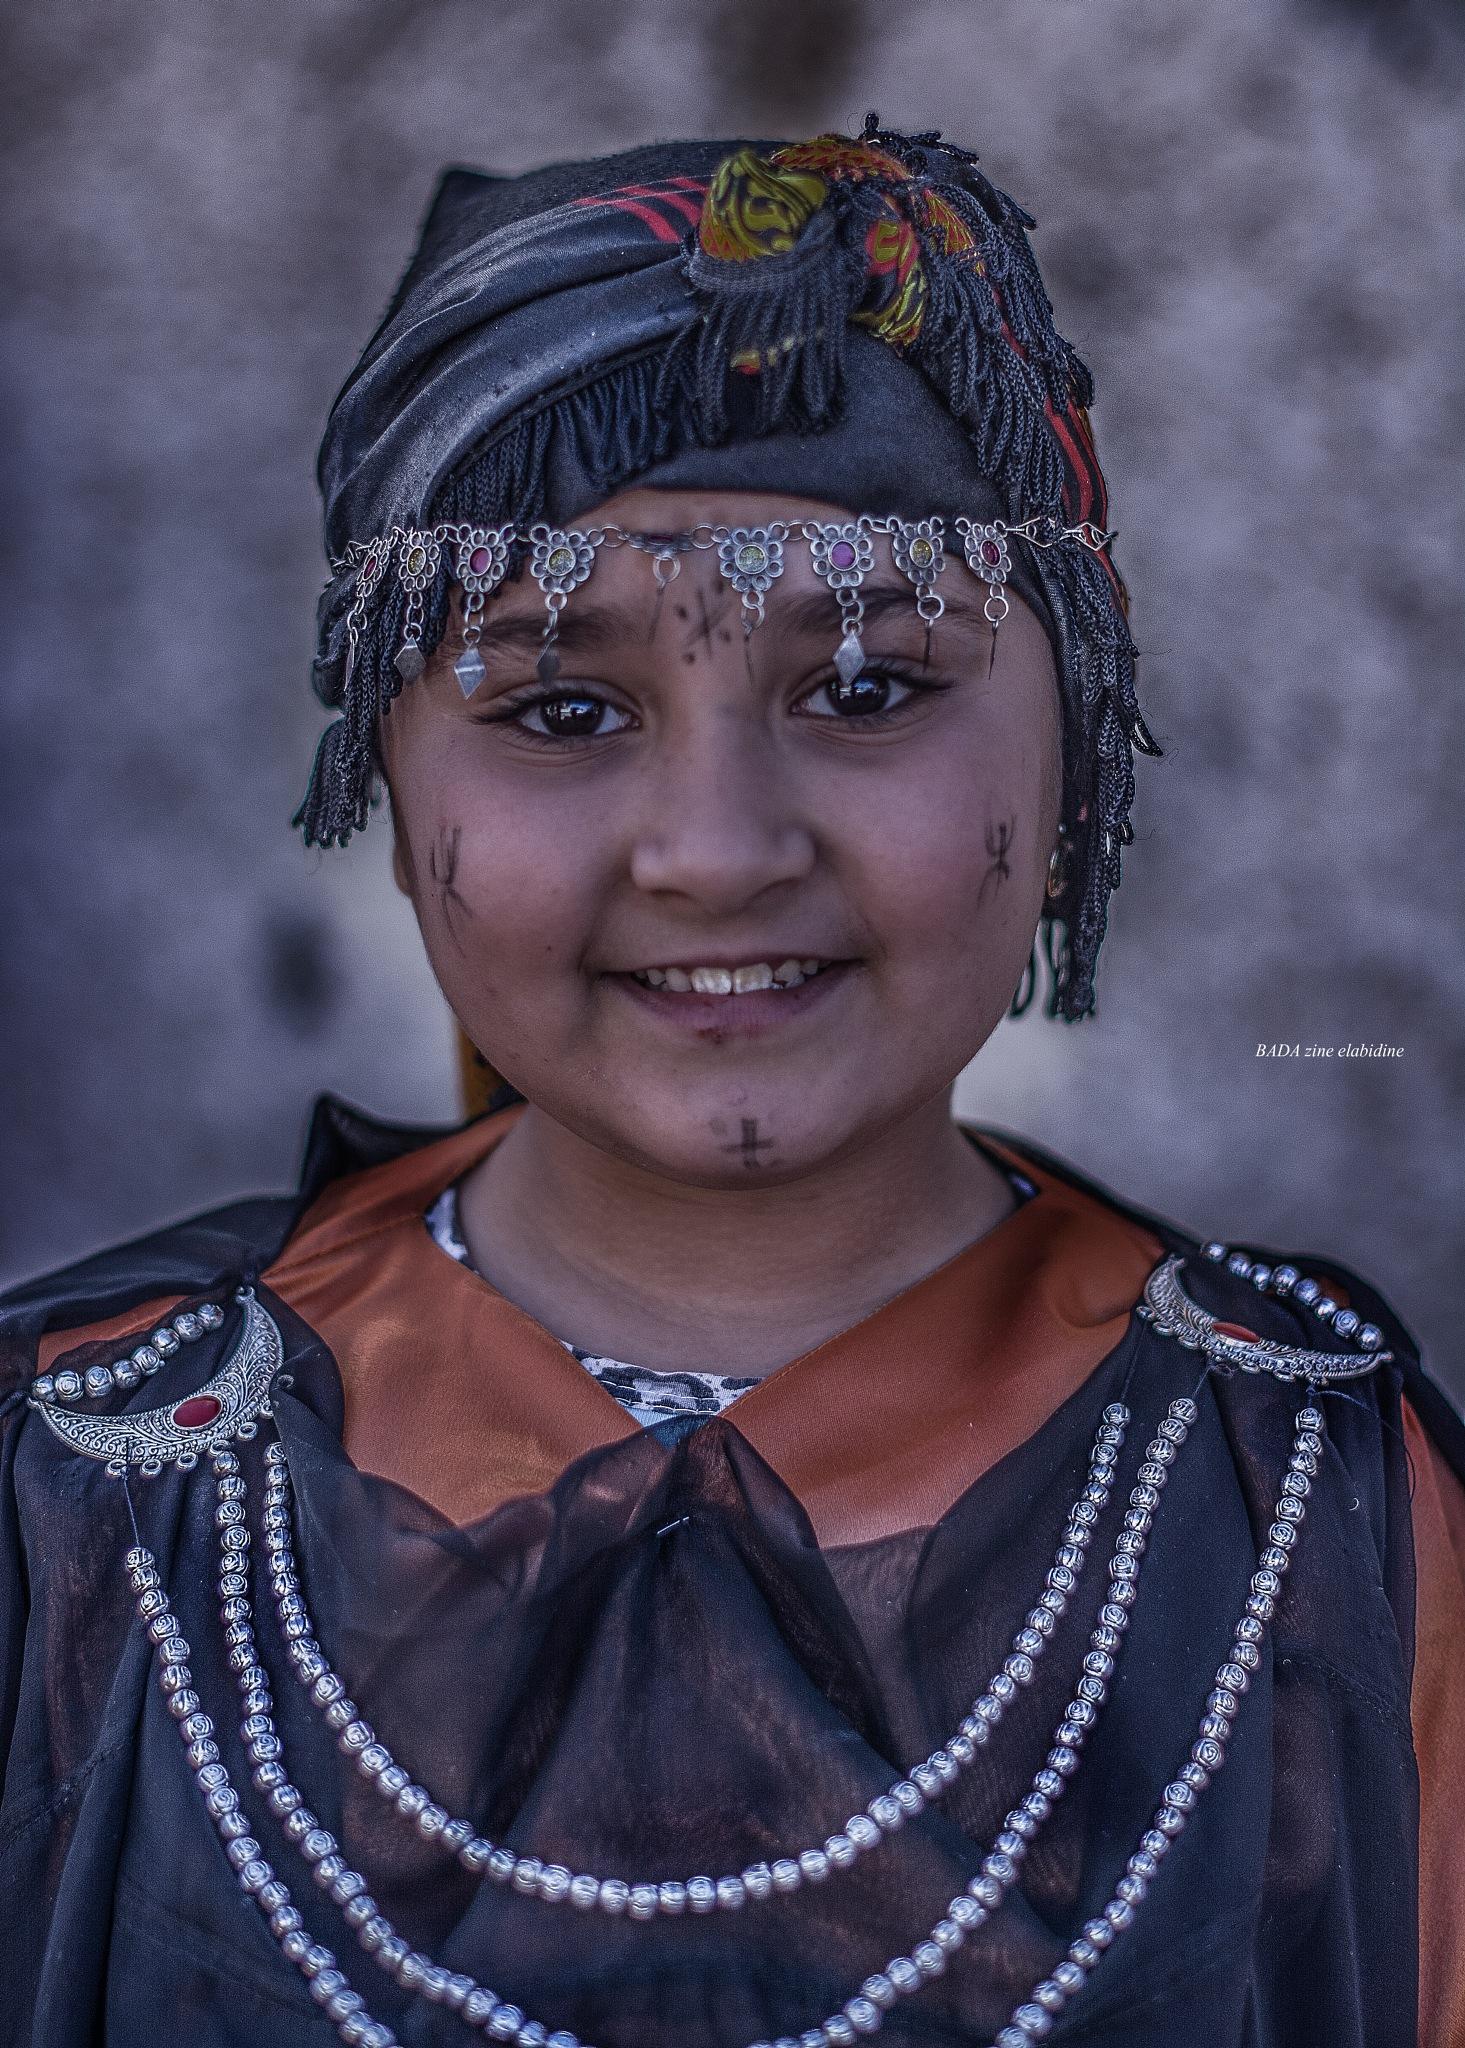 Untitled by Bada Zine El Abidine